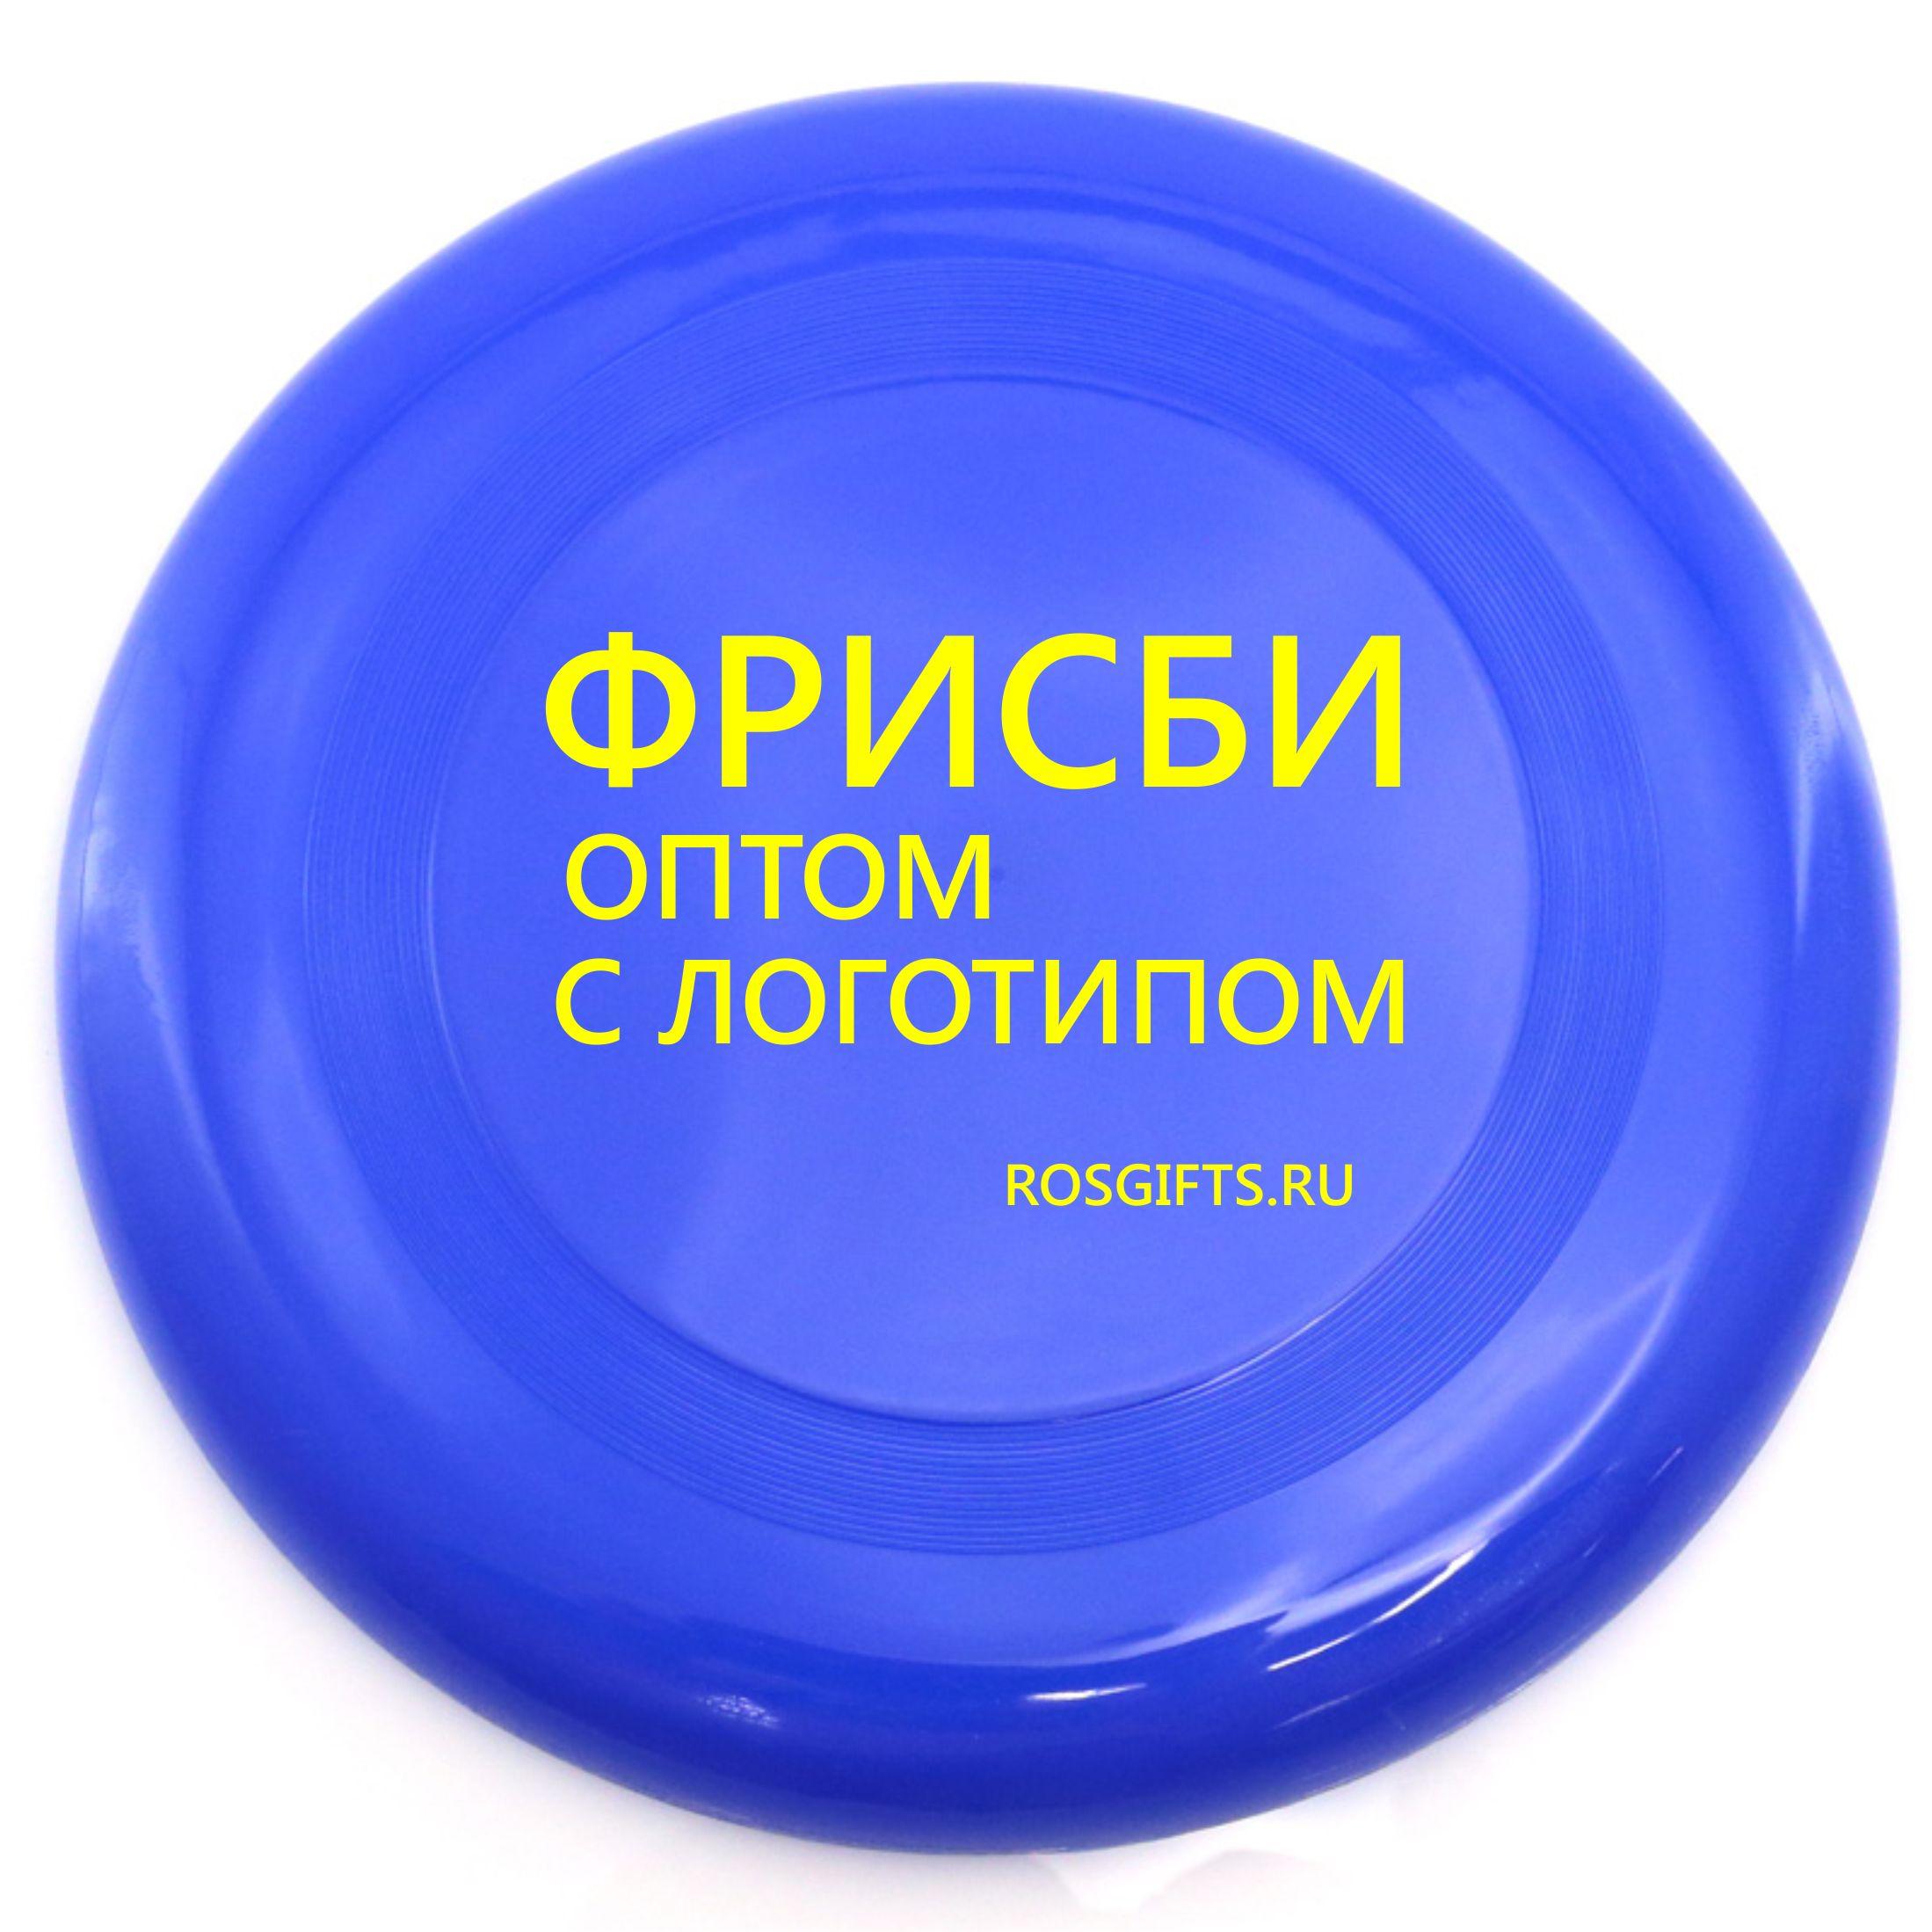 фрисби с логотипом в москве